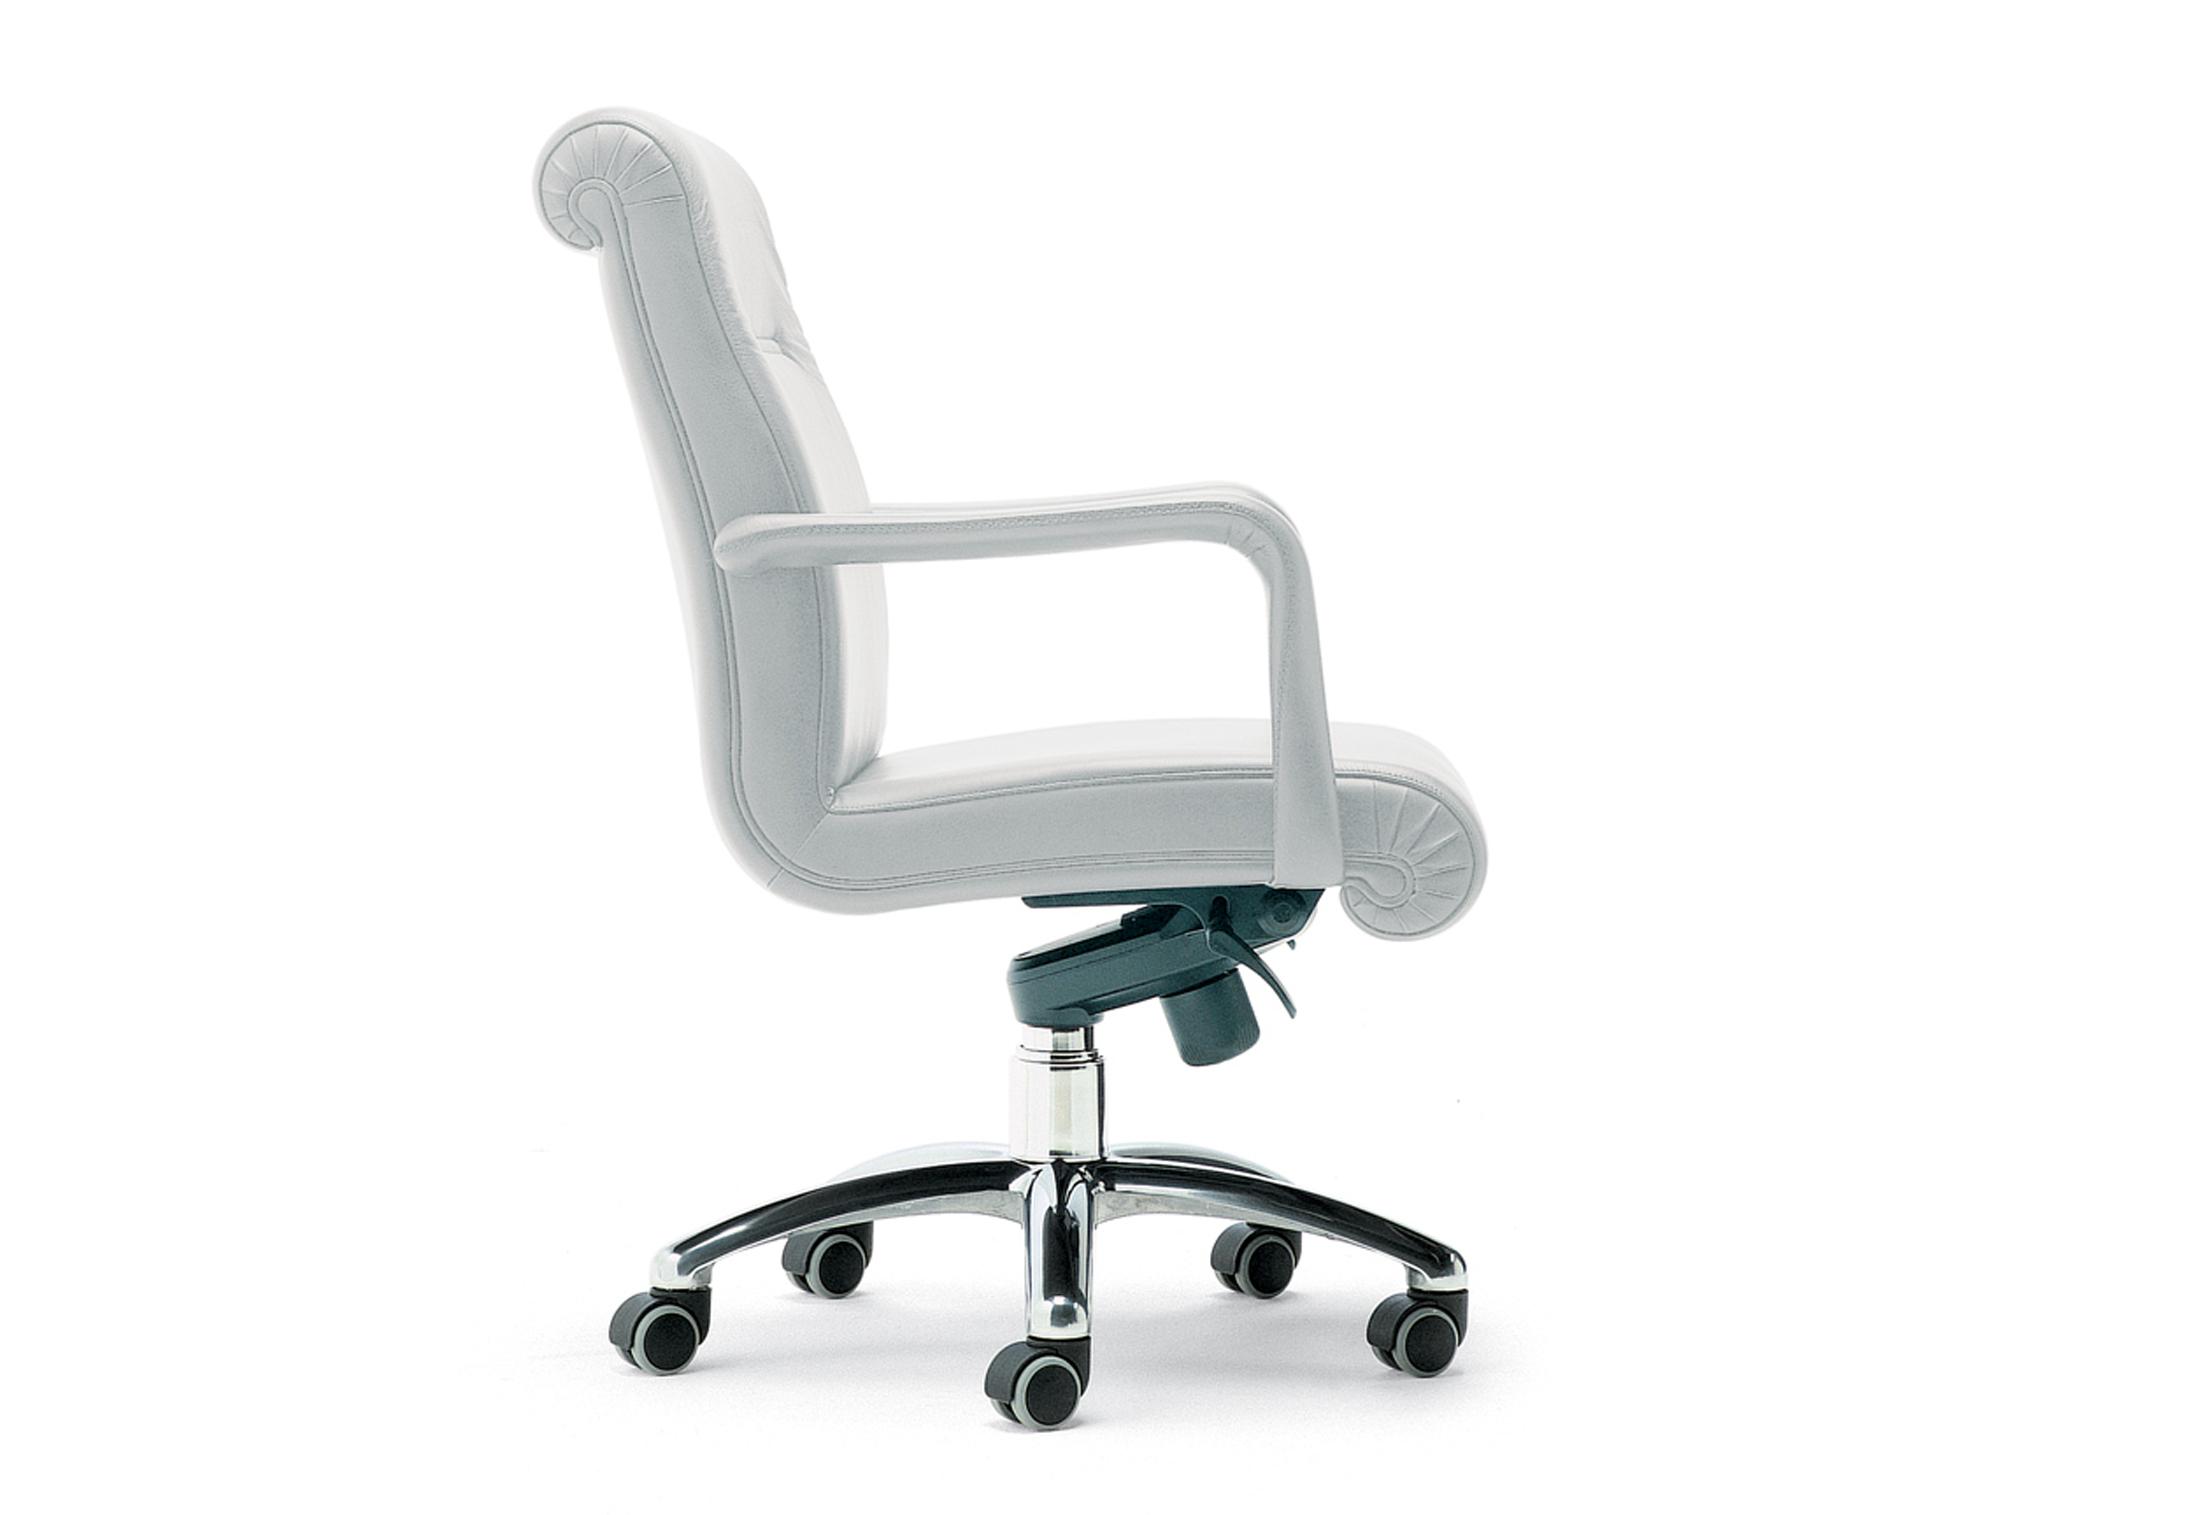 Swivel Bath Chair - Ivoiregion